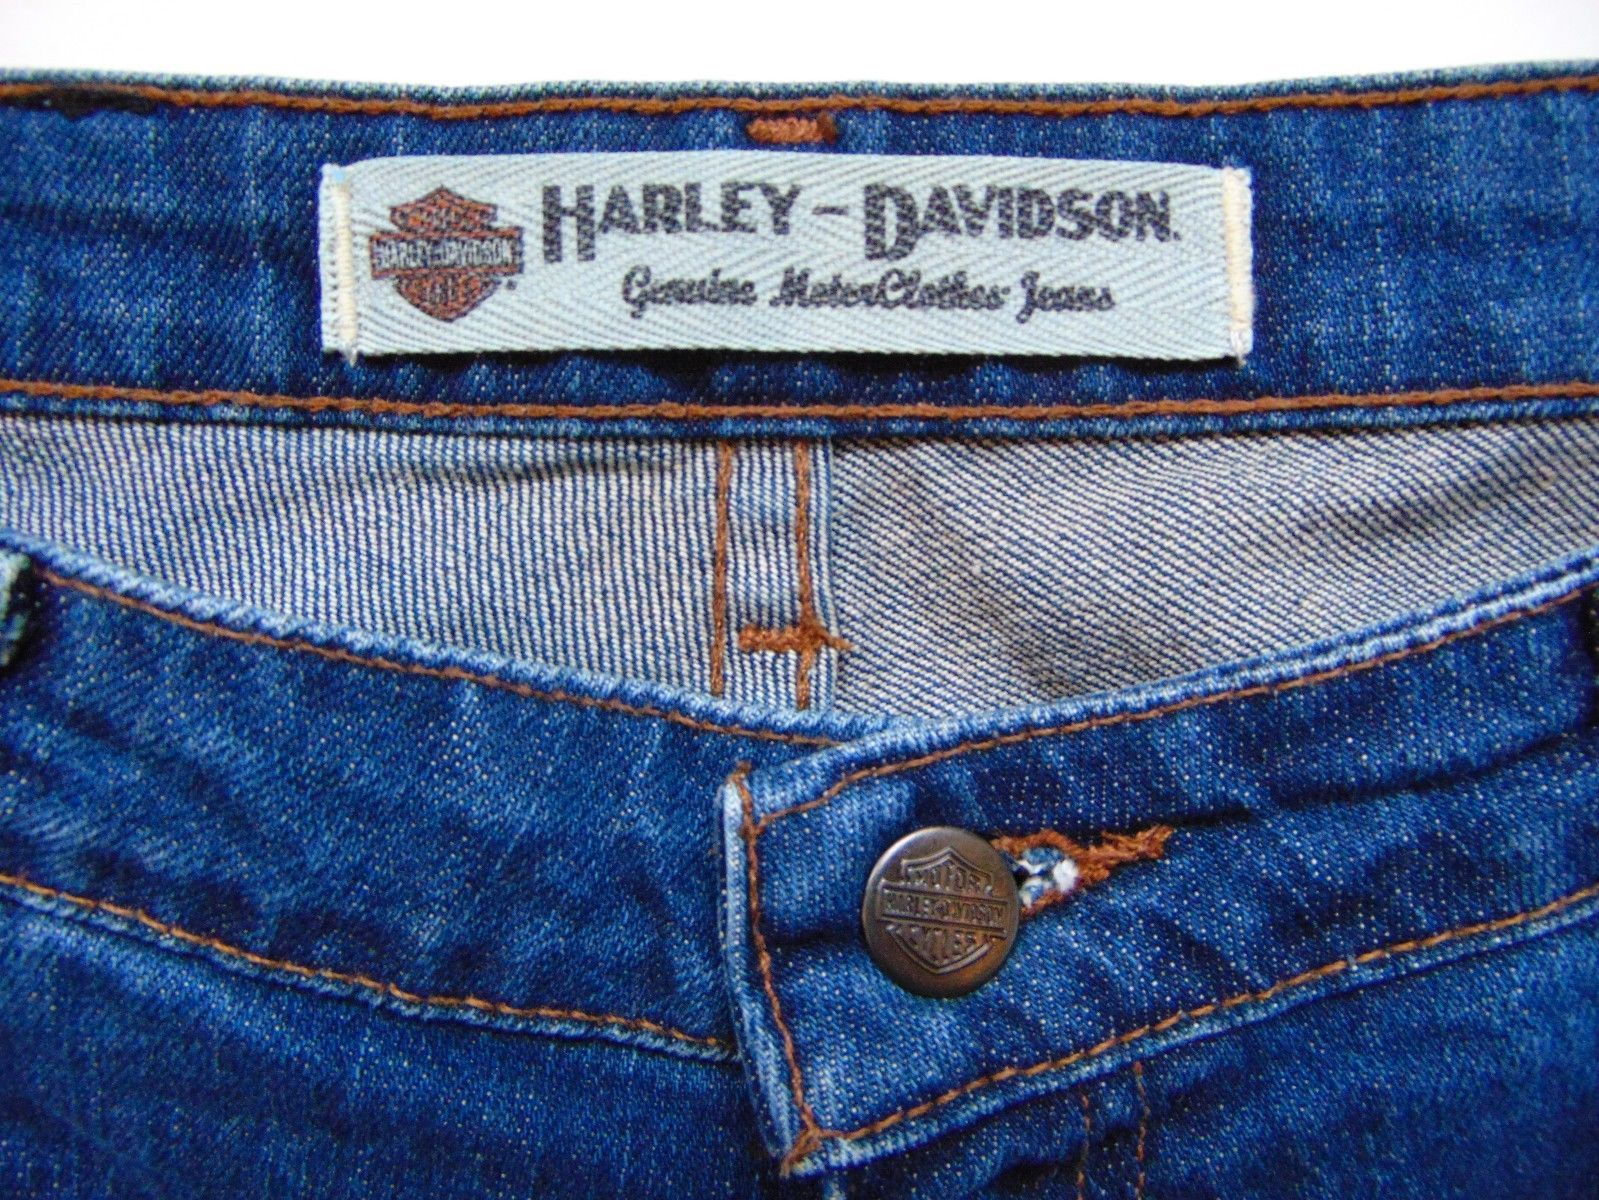 HARLEY DAVIDSON BLUE JEAN PANTS Women Size 6R Classic Cut Fit 30W x 32L